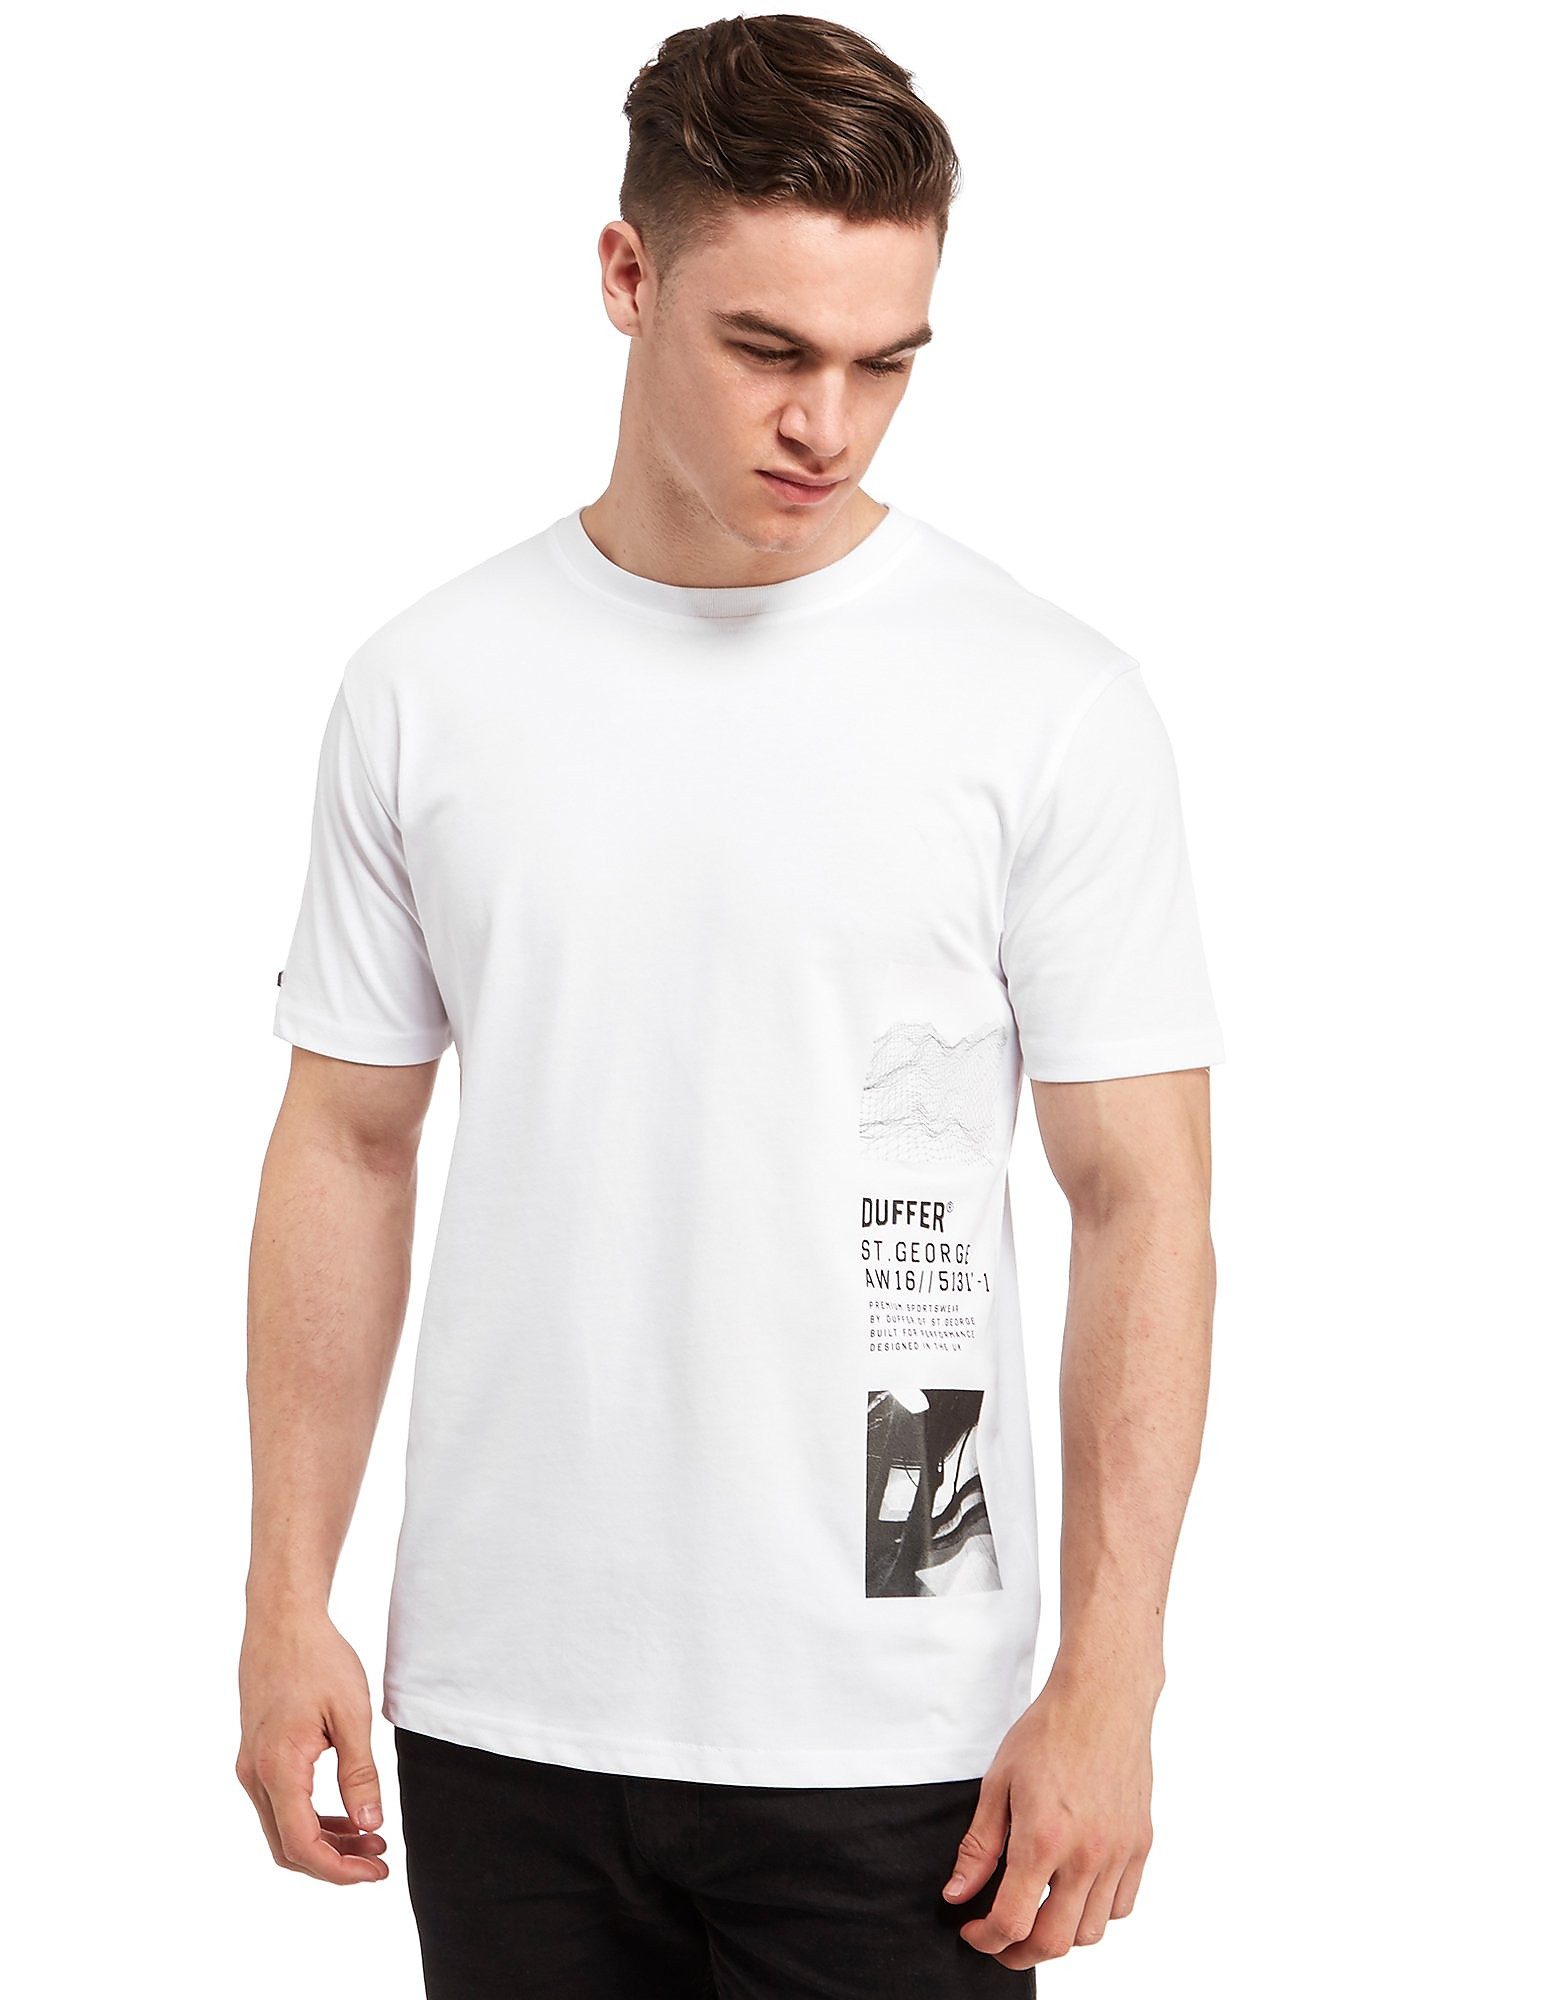 Duffer of St George Black Label Illusion T-Shirt